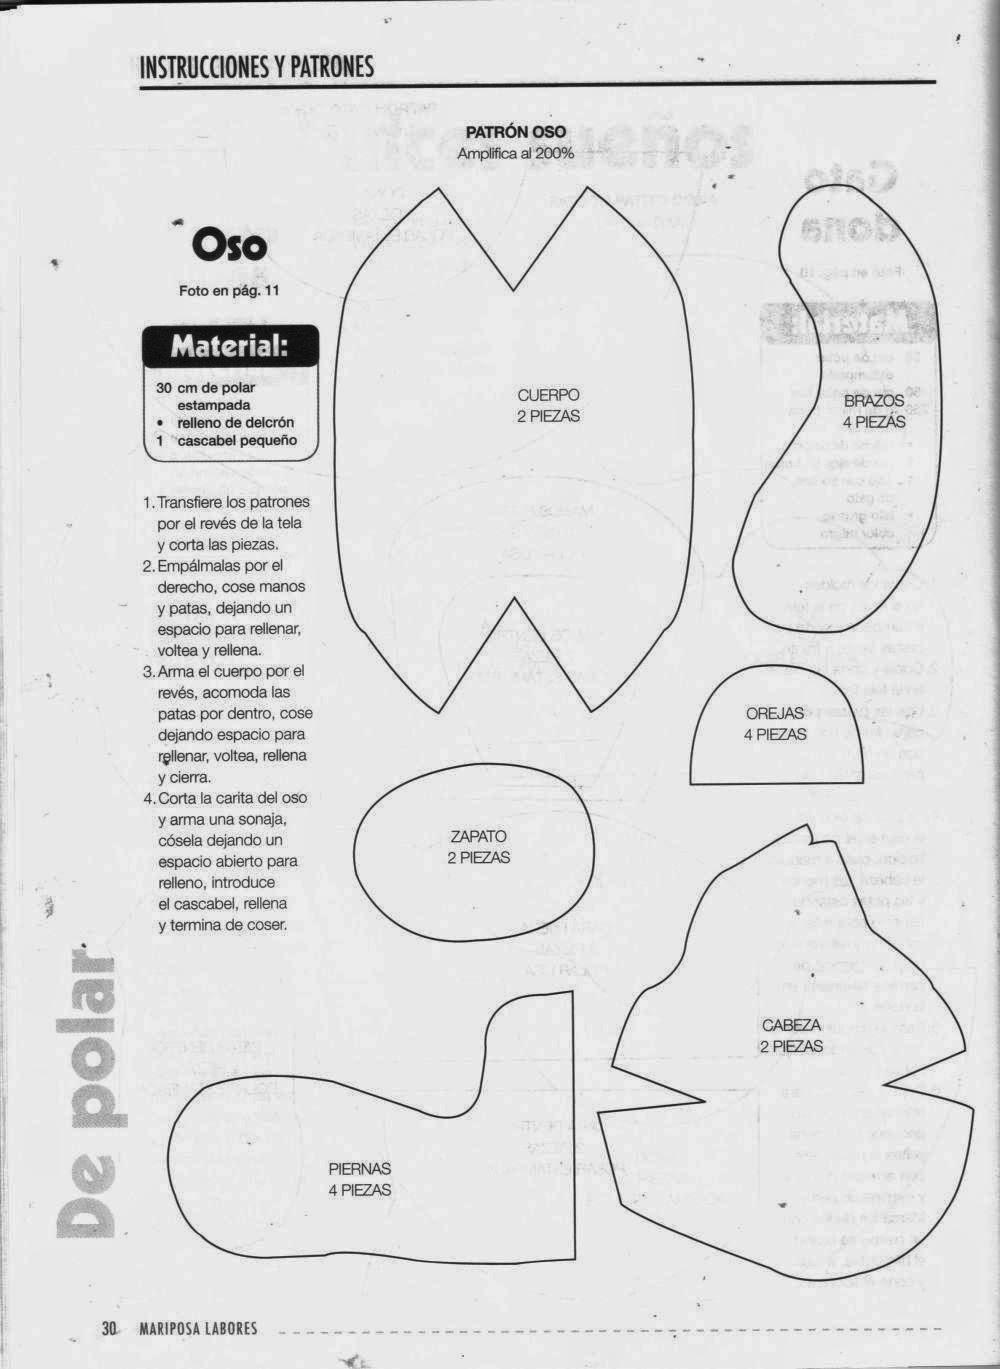 como hacer peluches - Revistas de manualidades gratis